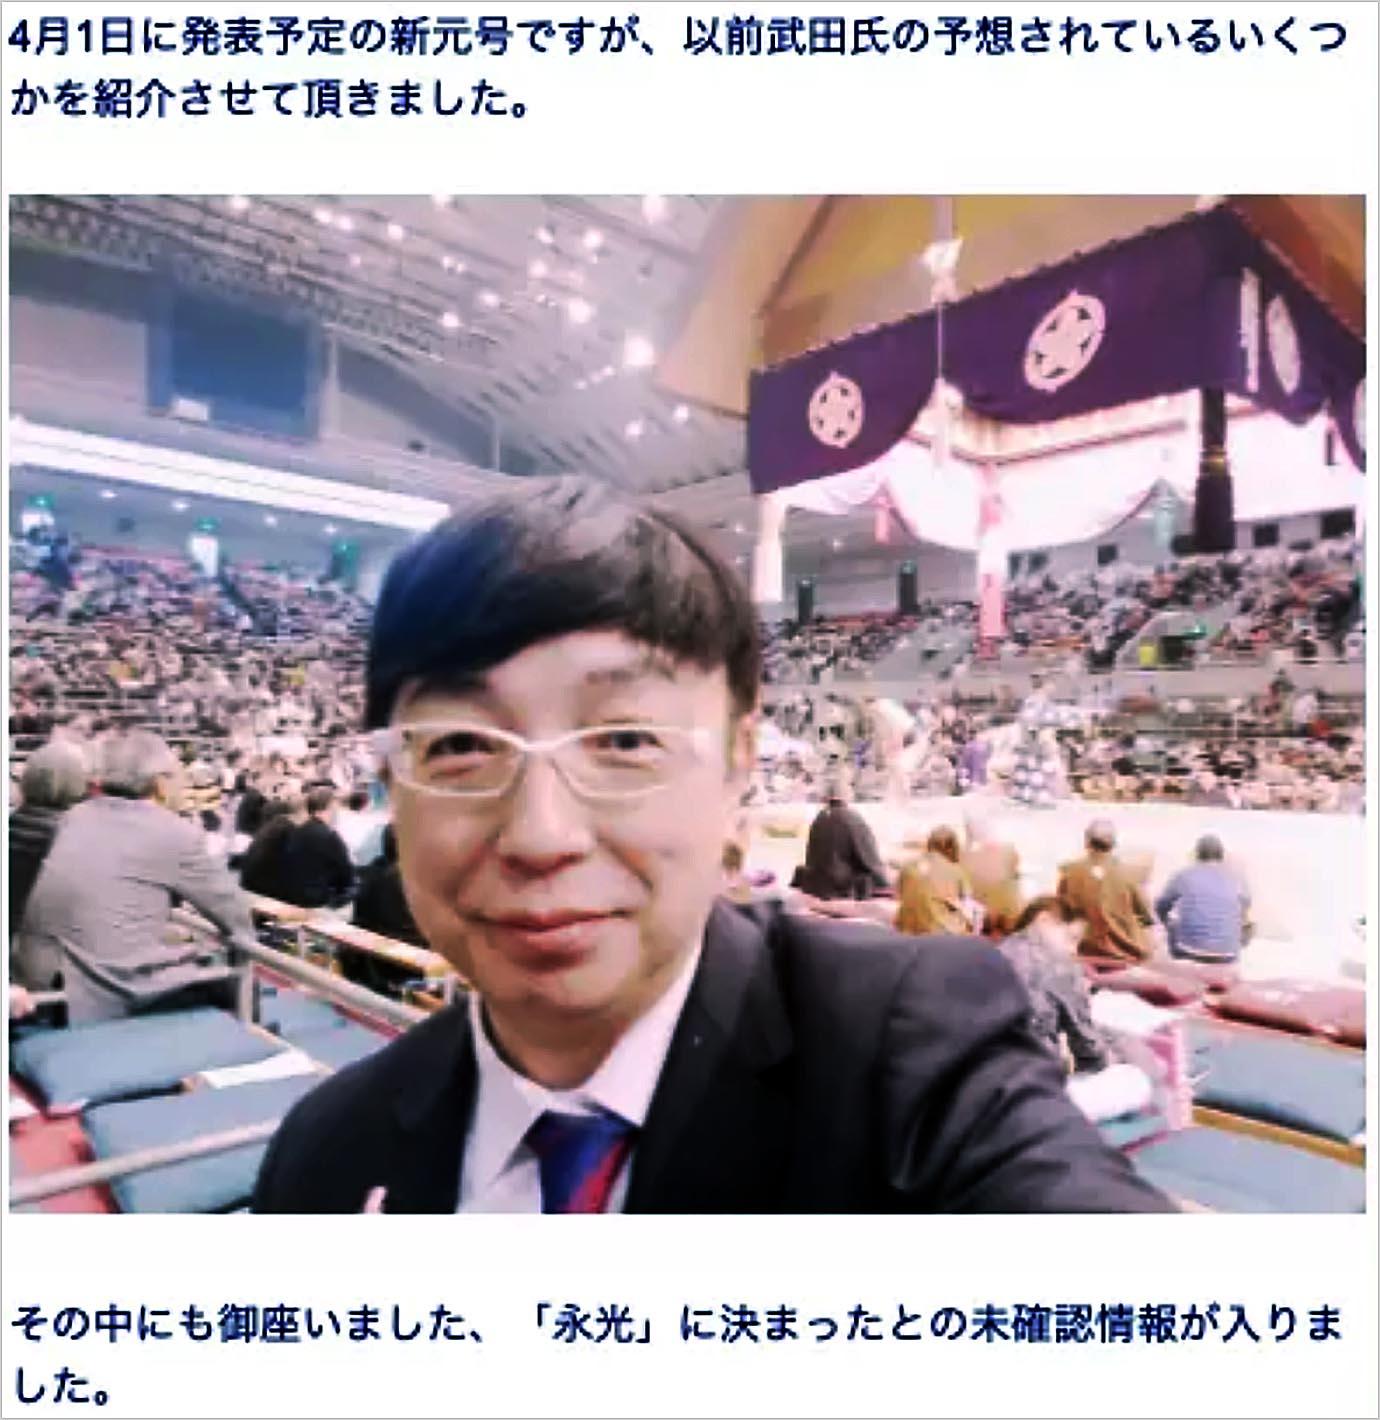 shin-gengou-eikou